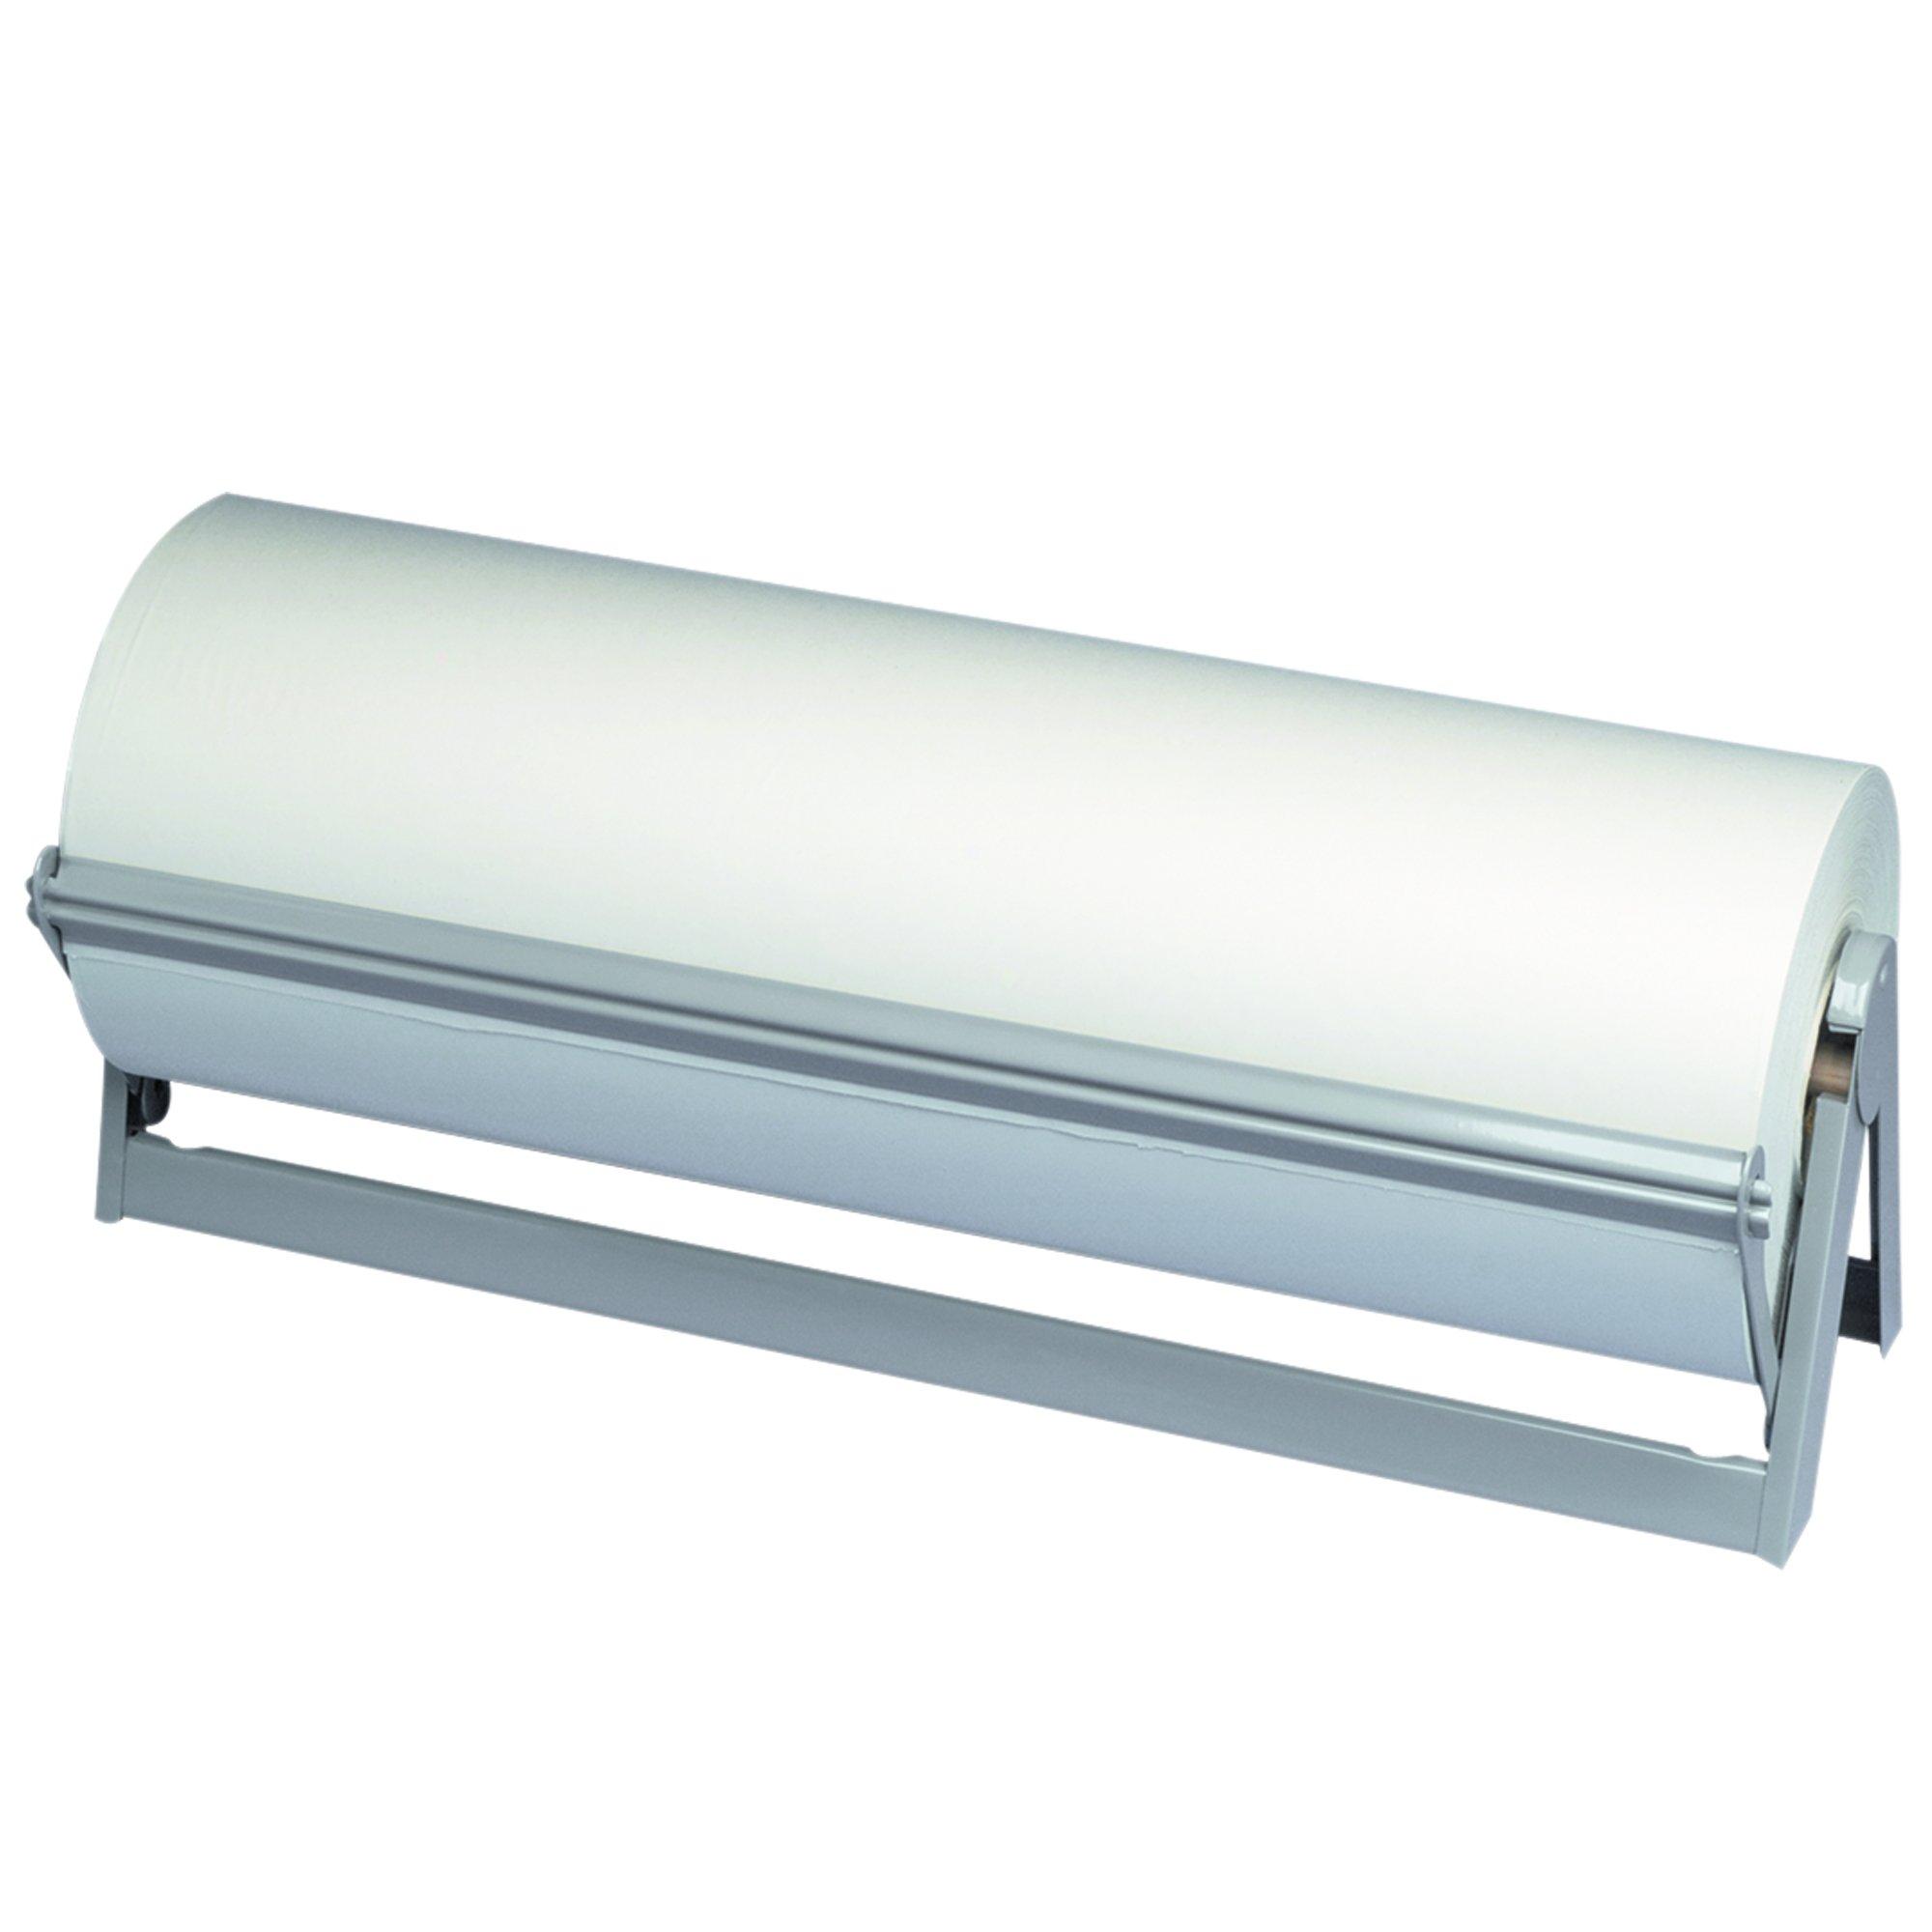 Tape Logic TLNP3690 Newsprint Roll, 30#, 36'' x 1,440', White by Tape Logic